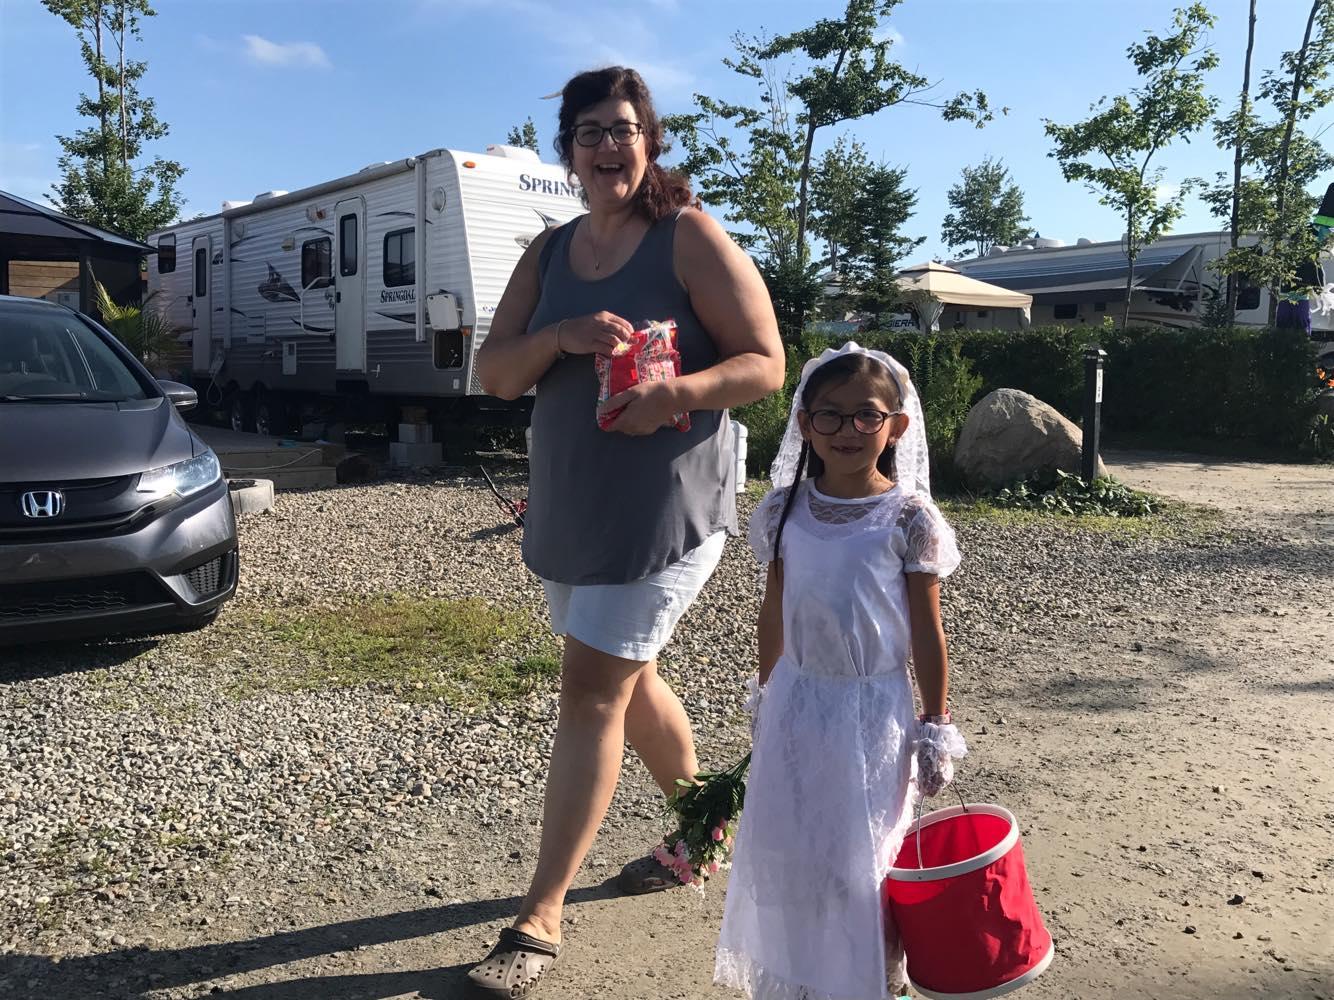 http://www.campingatlantide.com/wp-content/uploads/2018/08/halloween-complexe-atlantide-2018-24.jpg